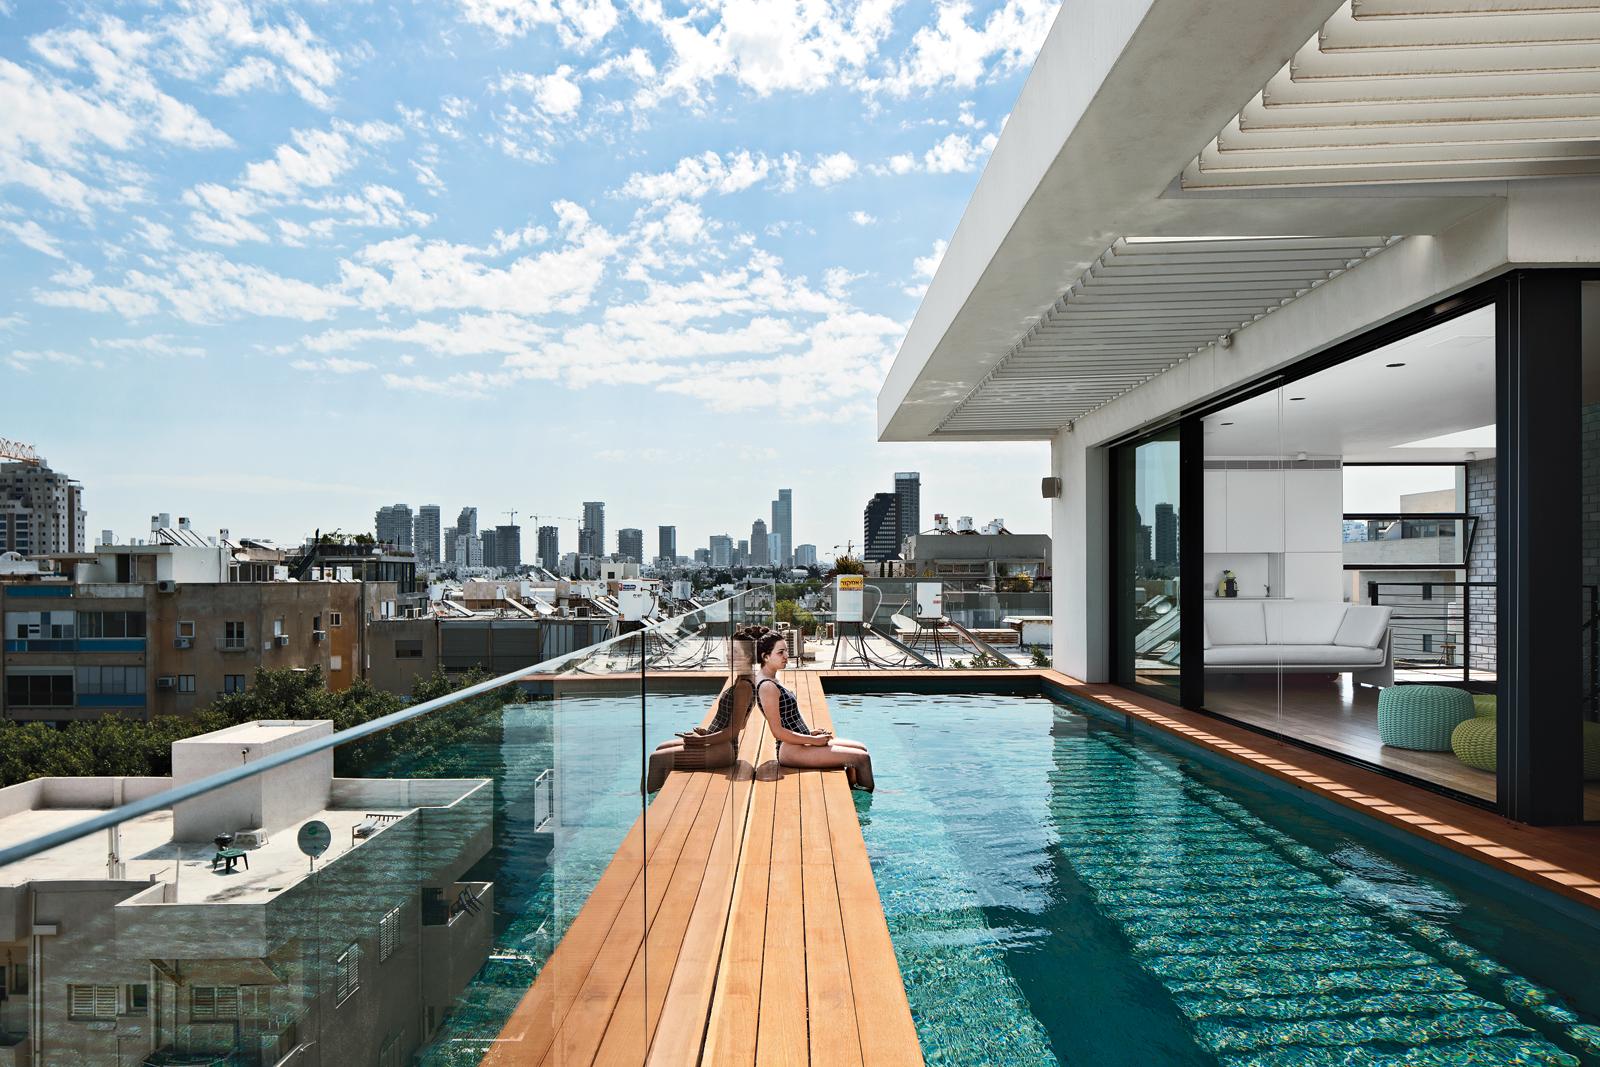 hai life outdoor pool